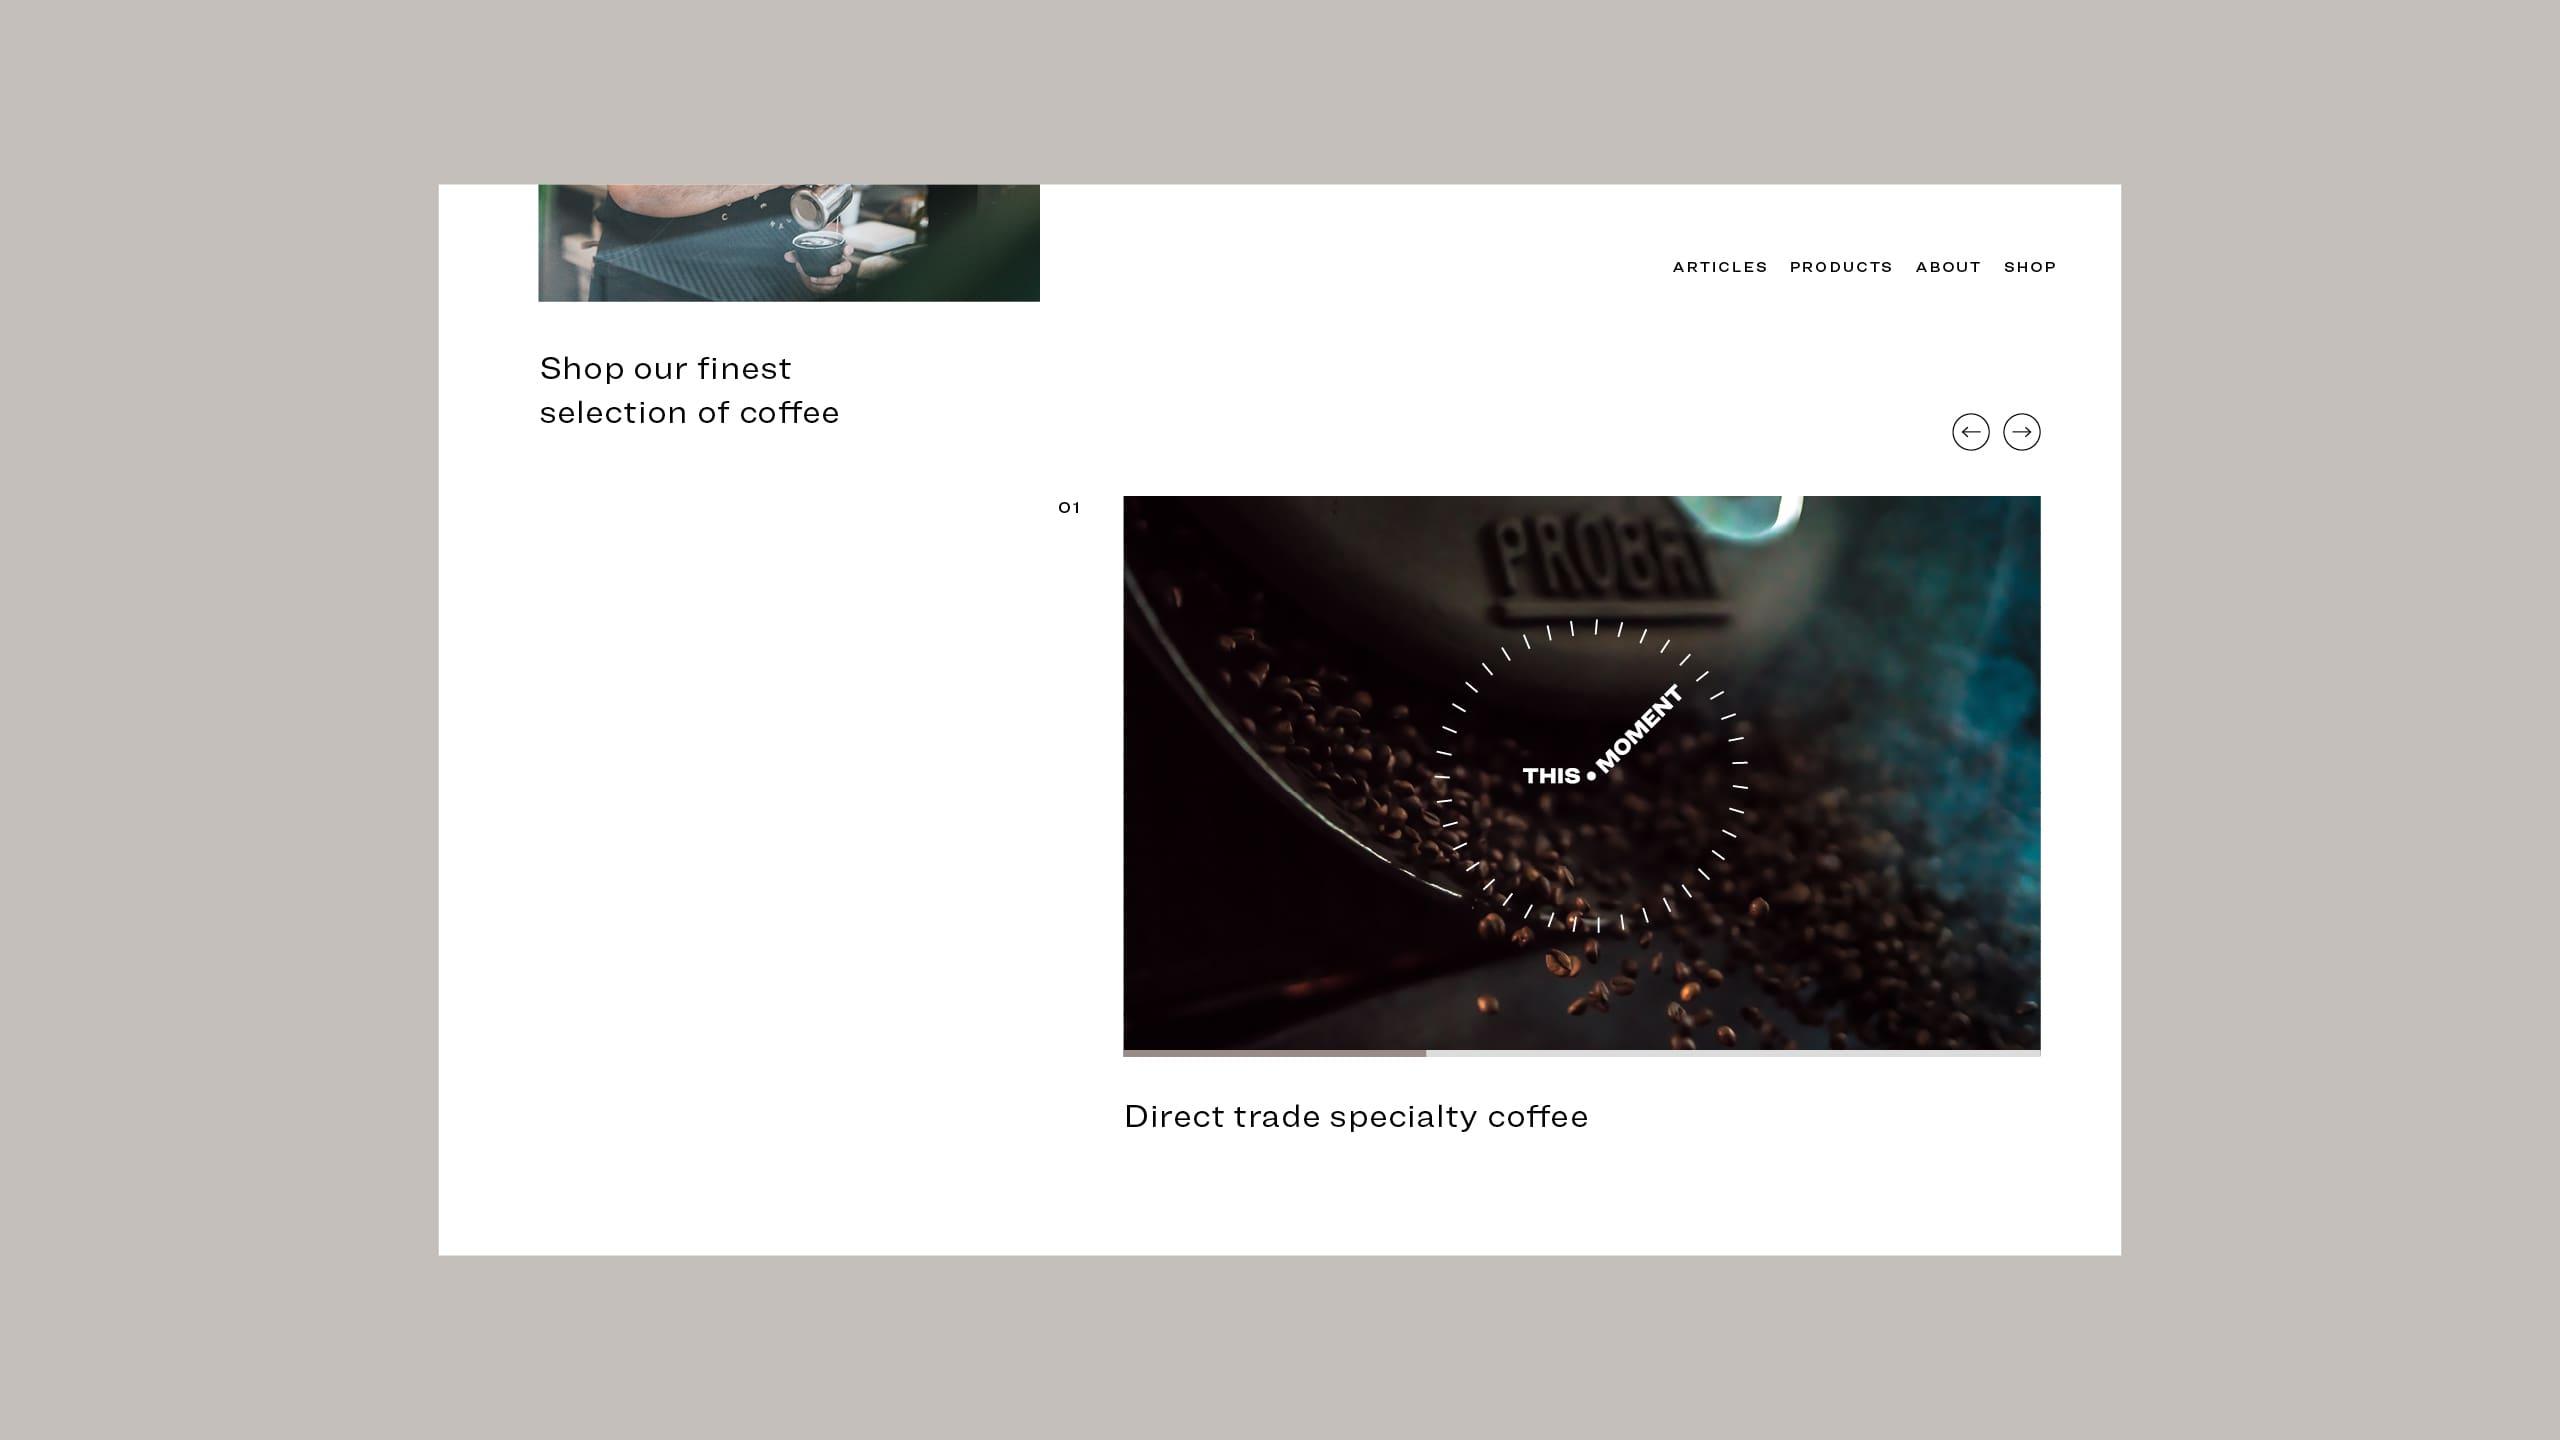 mantik-digital-branding-development-agency-creative-app-ui-web-branding-14-min-1